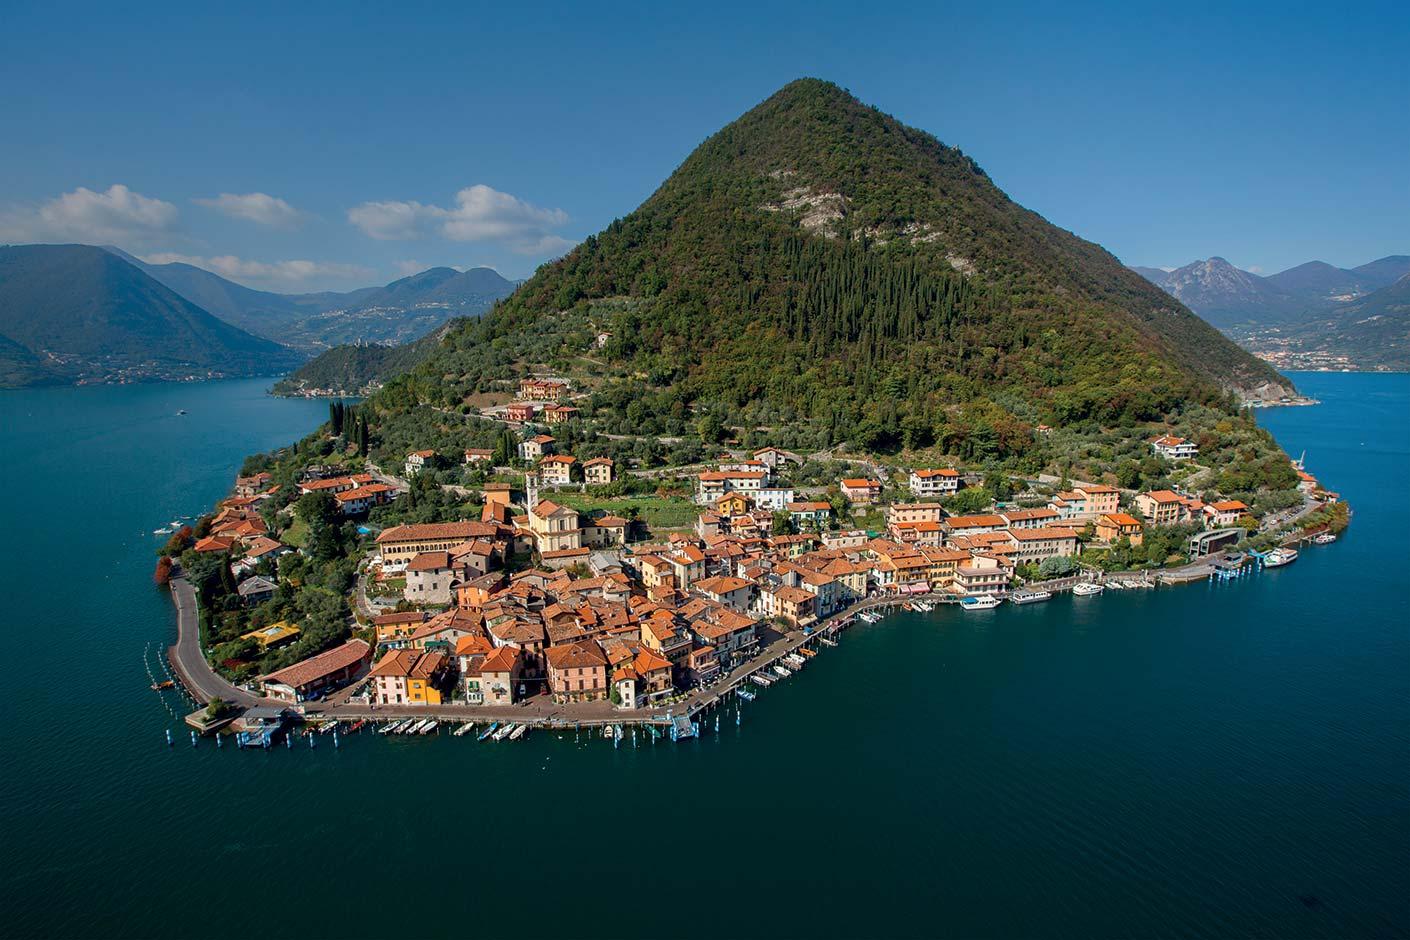 montisola-najvacsi-ostrov-jazera-v-europe-secret-world